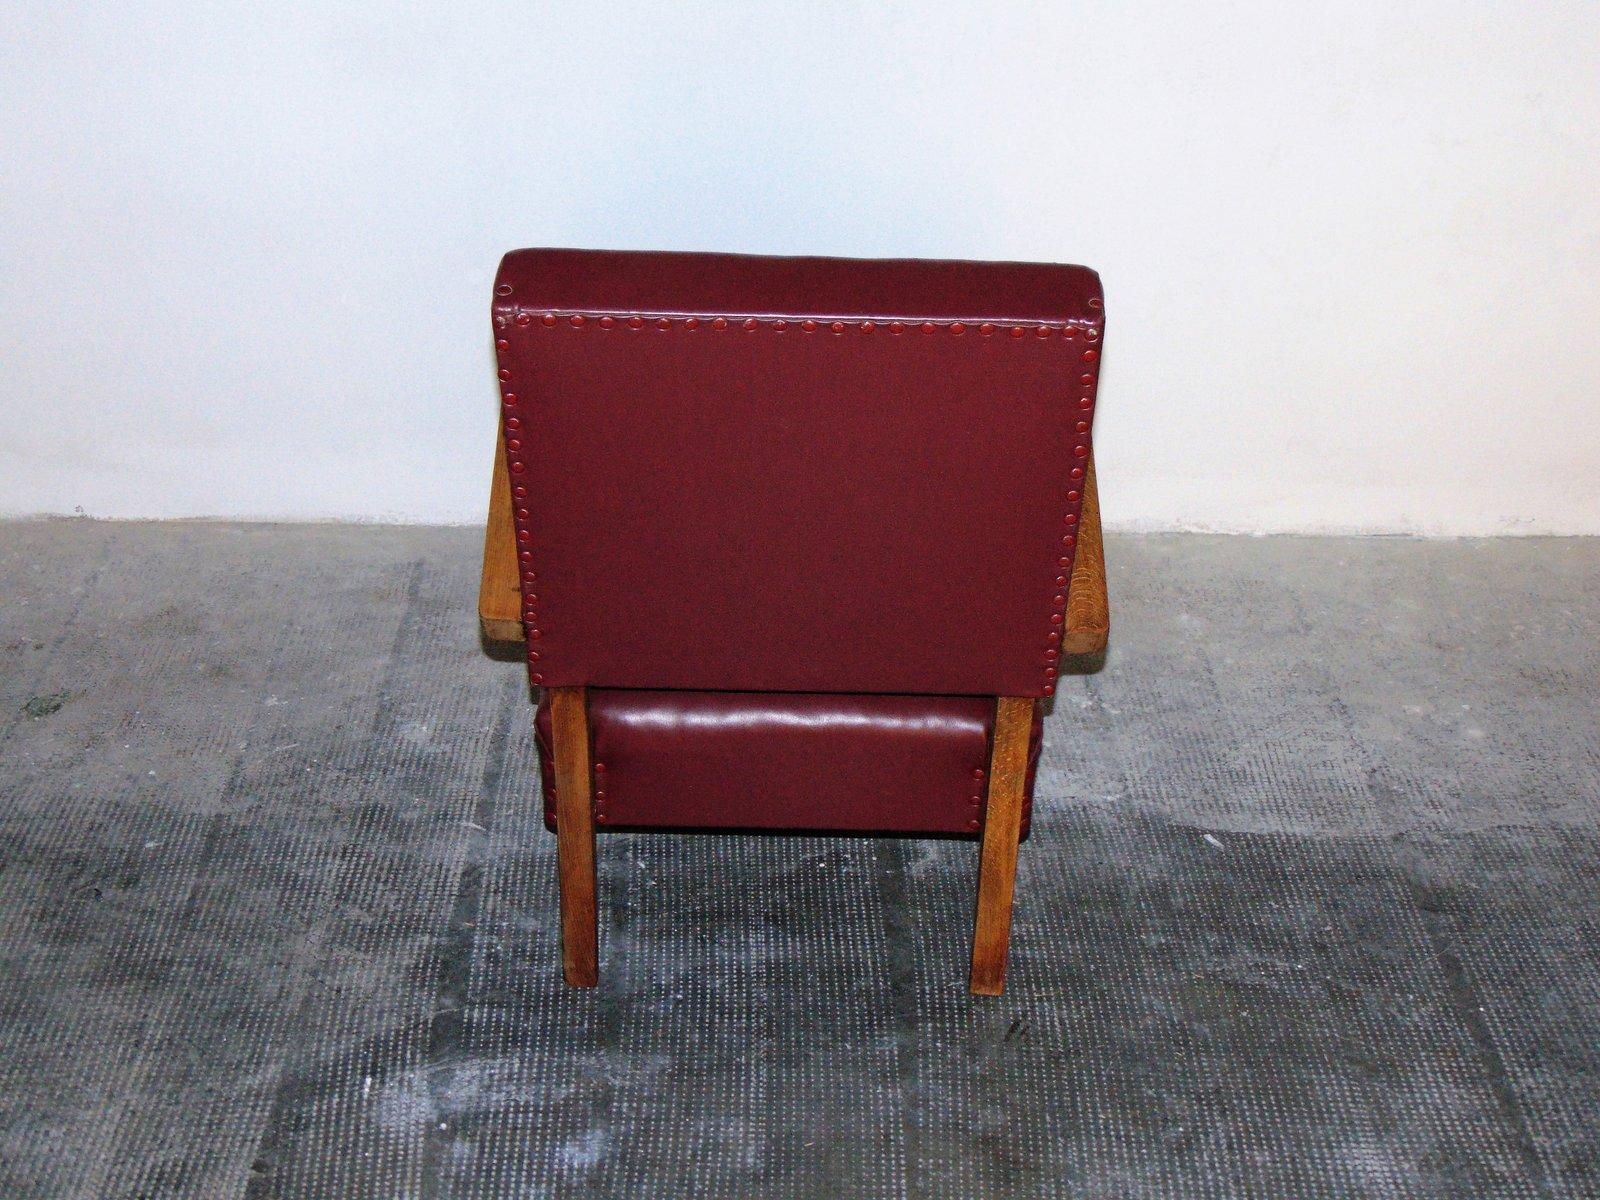 fauteuil en skai italie 1950s en vente sur pamono. Black Bedroom Furniture Sets. Home Design Ideas